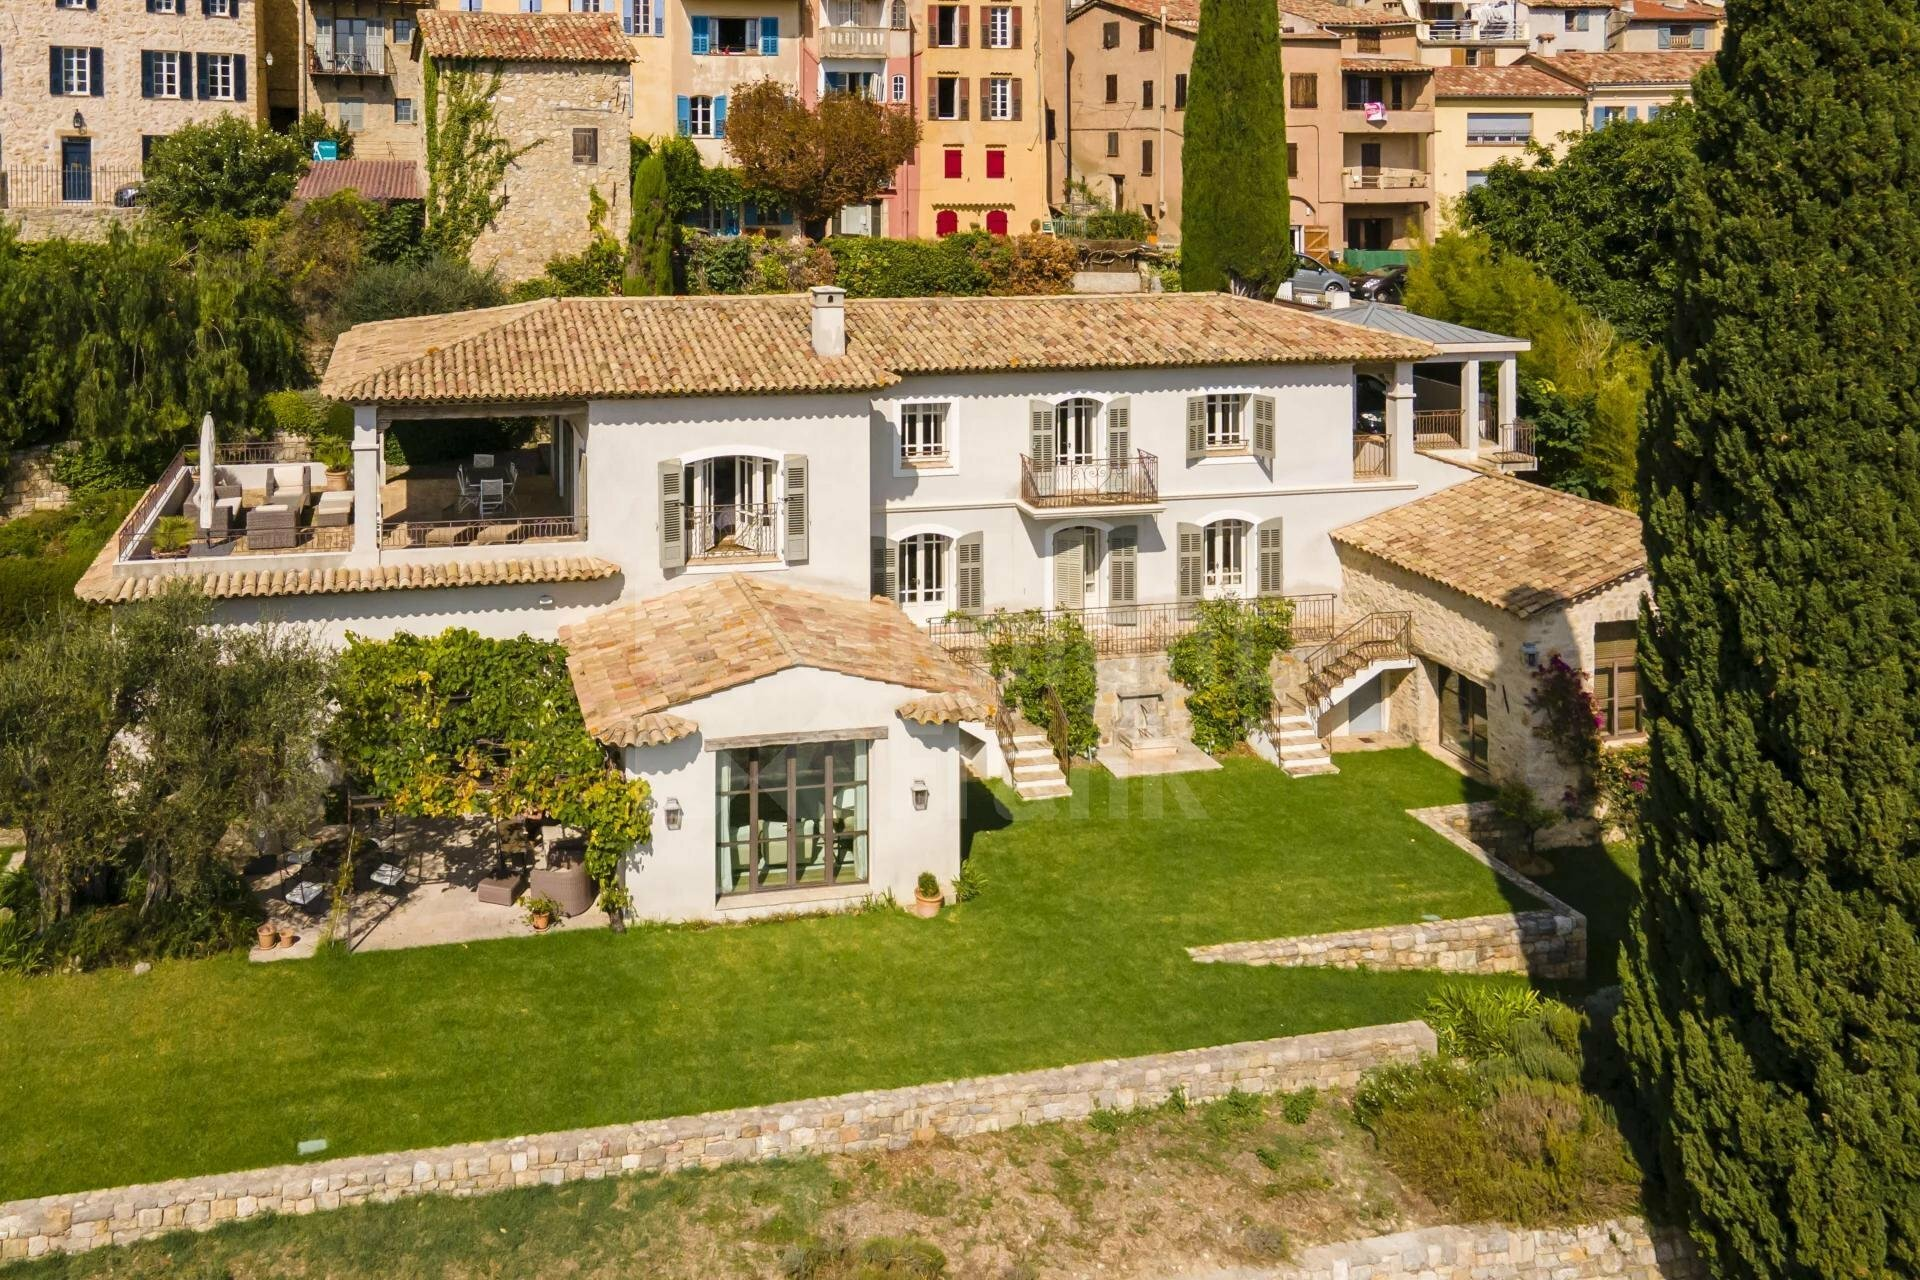 Villa in Châteauneuf, Provence-Alpes-Côte d'Azur, France 1 - 11652035